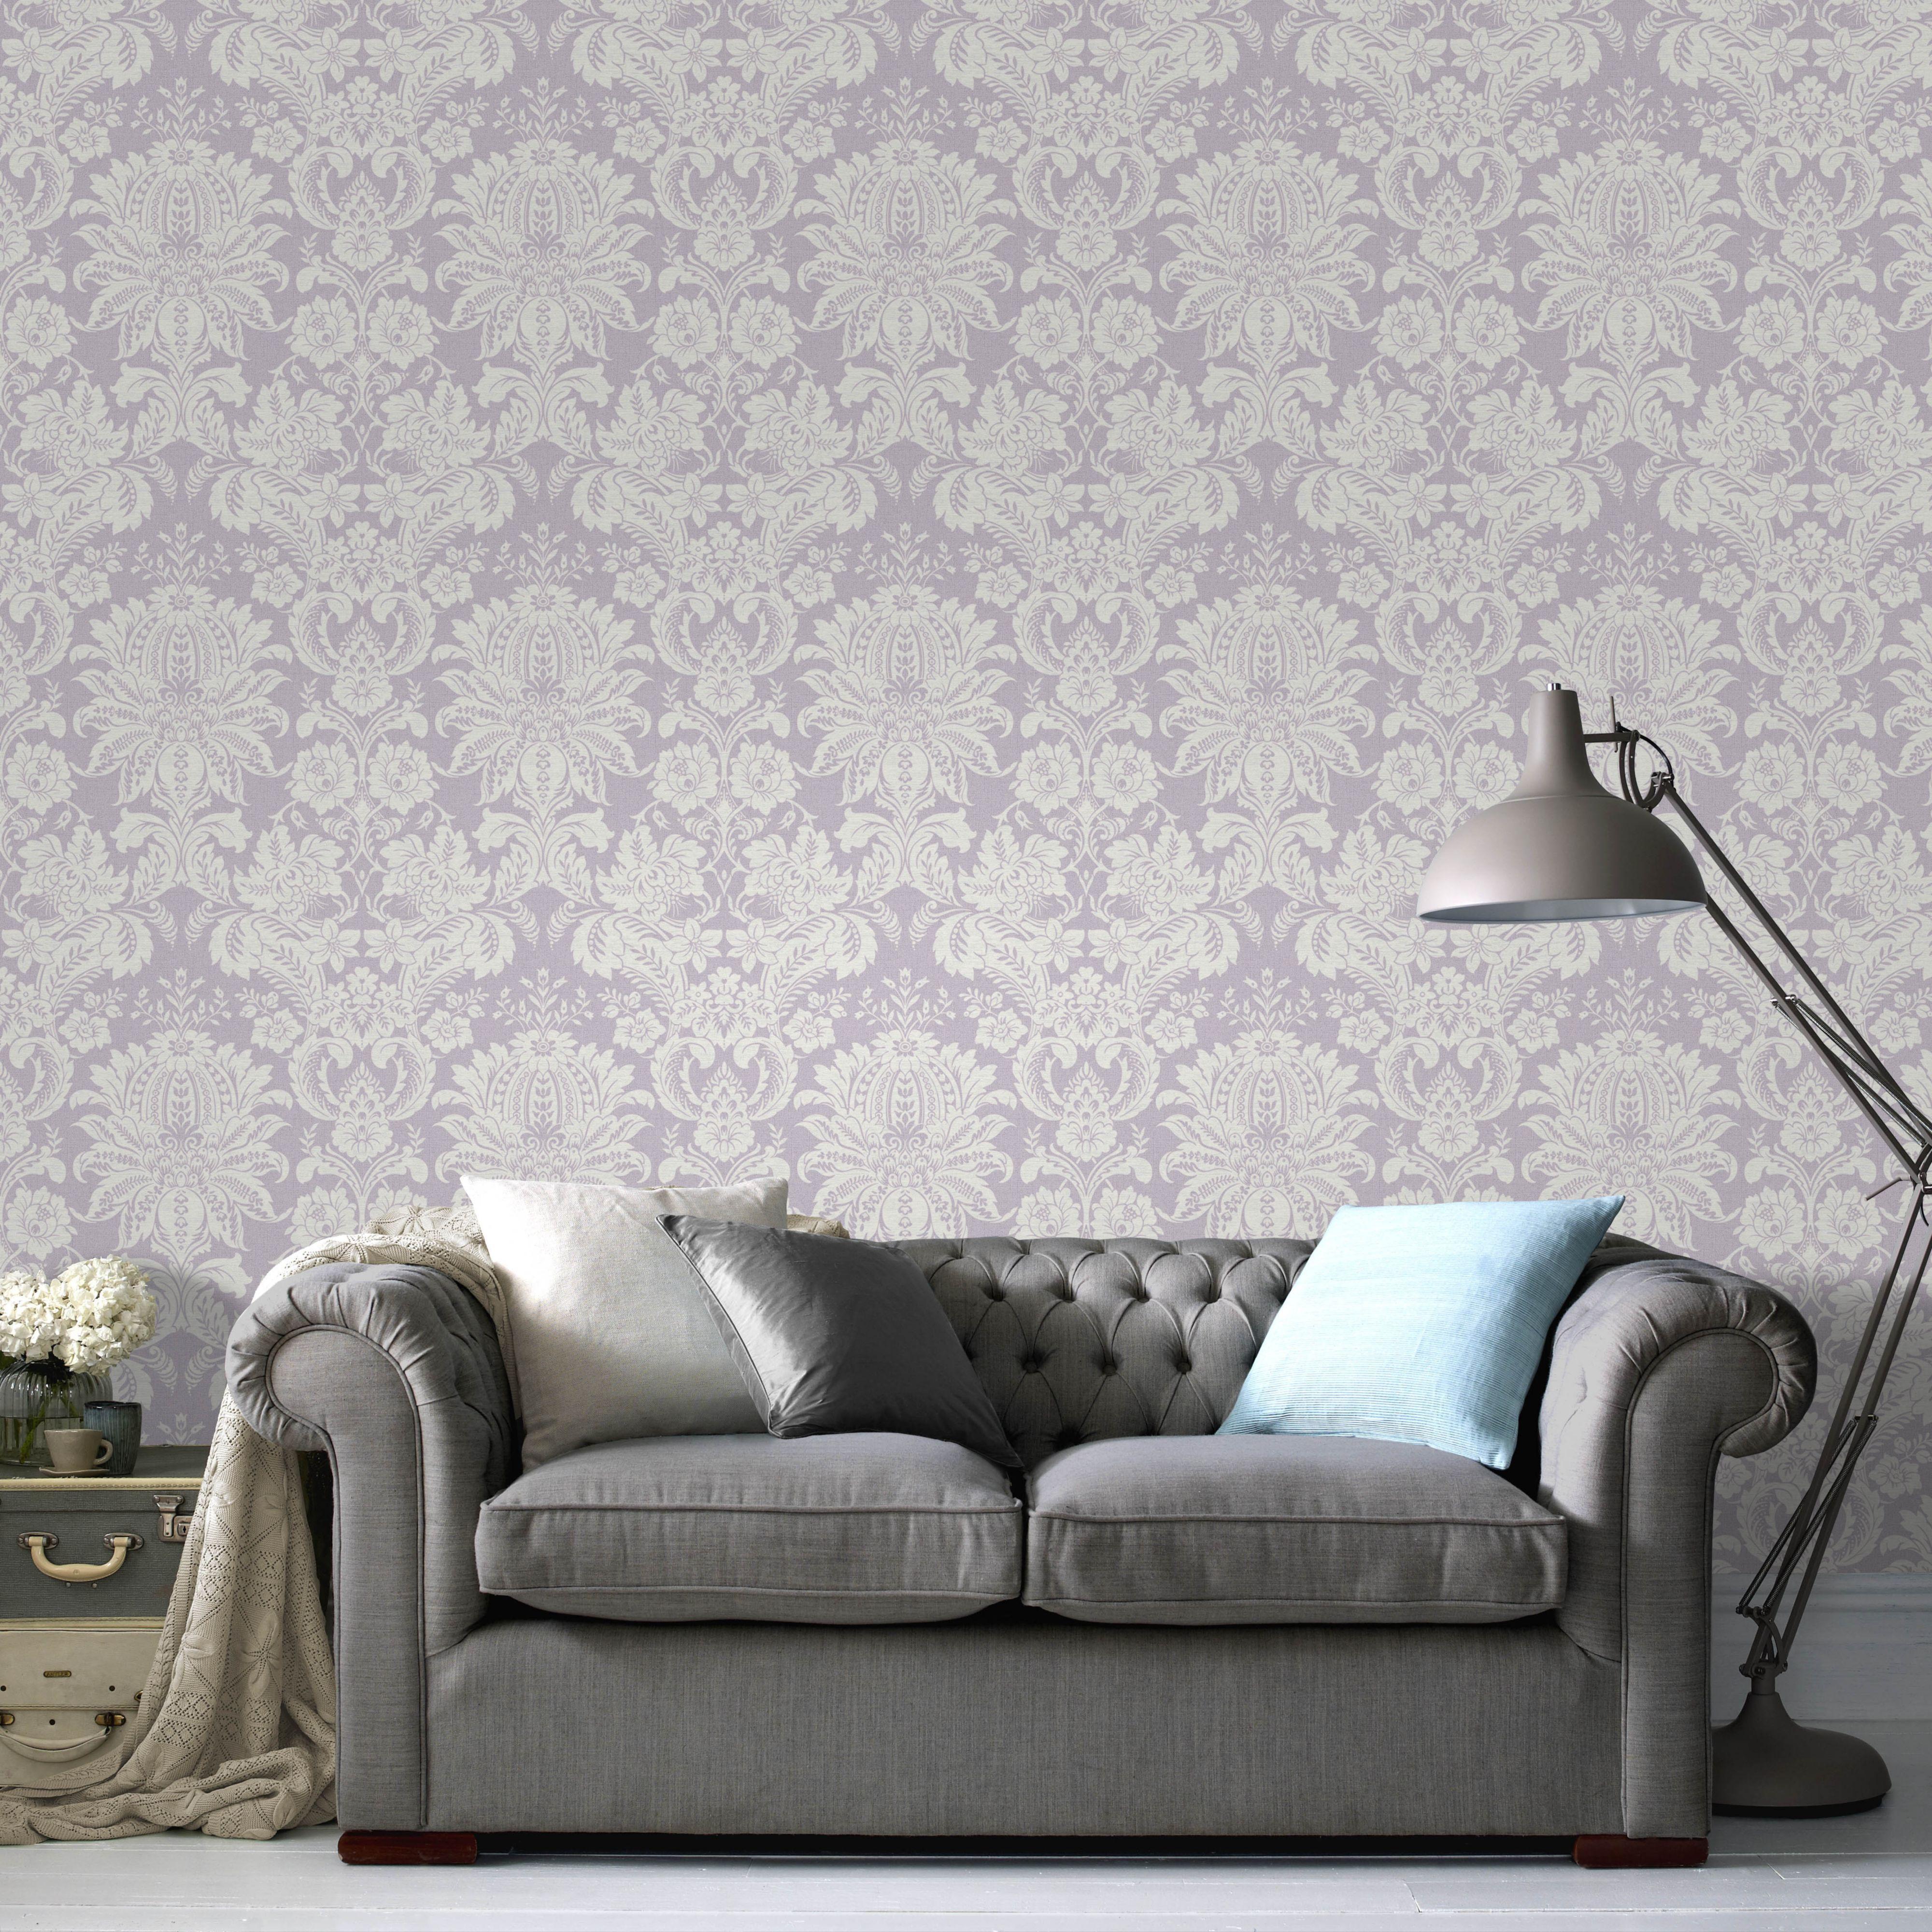 Superfresco Easy Lilac Venetian Wallpaper